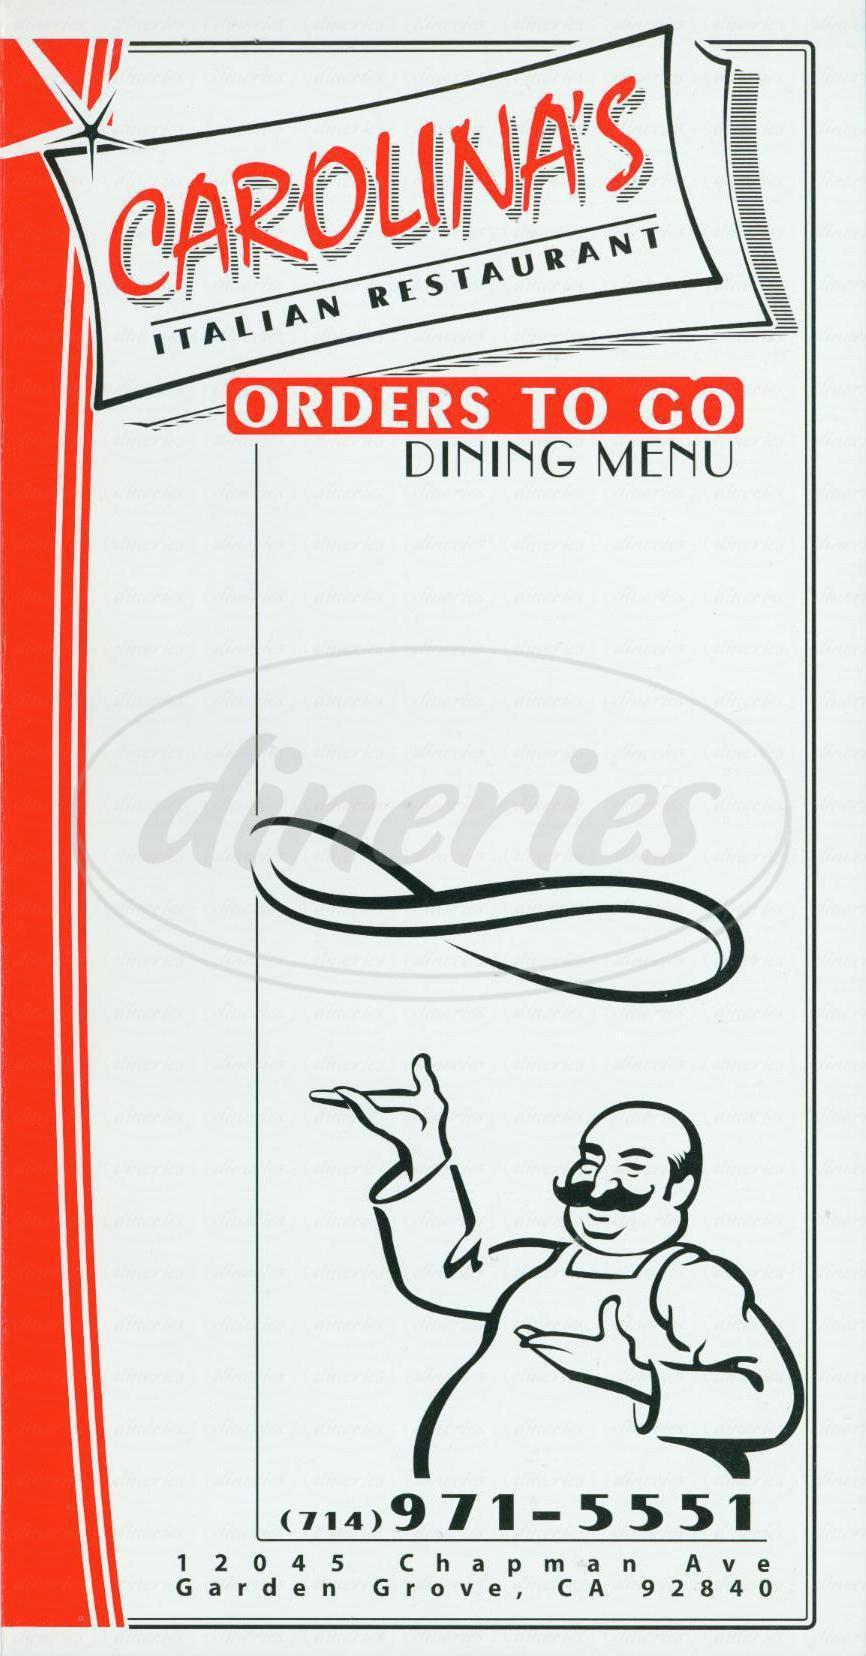 menu for Carolinas Italian Cuisine